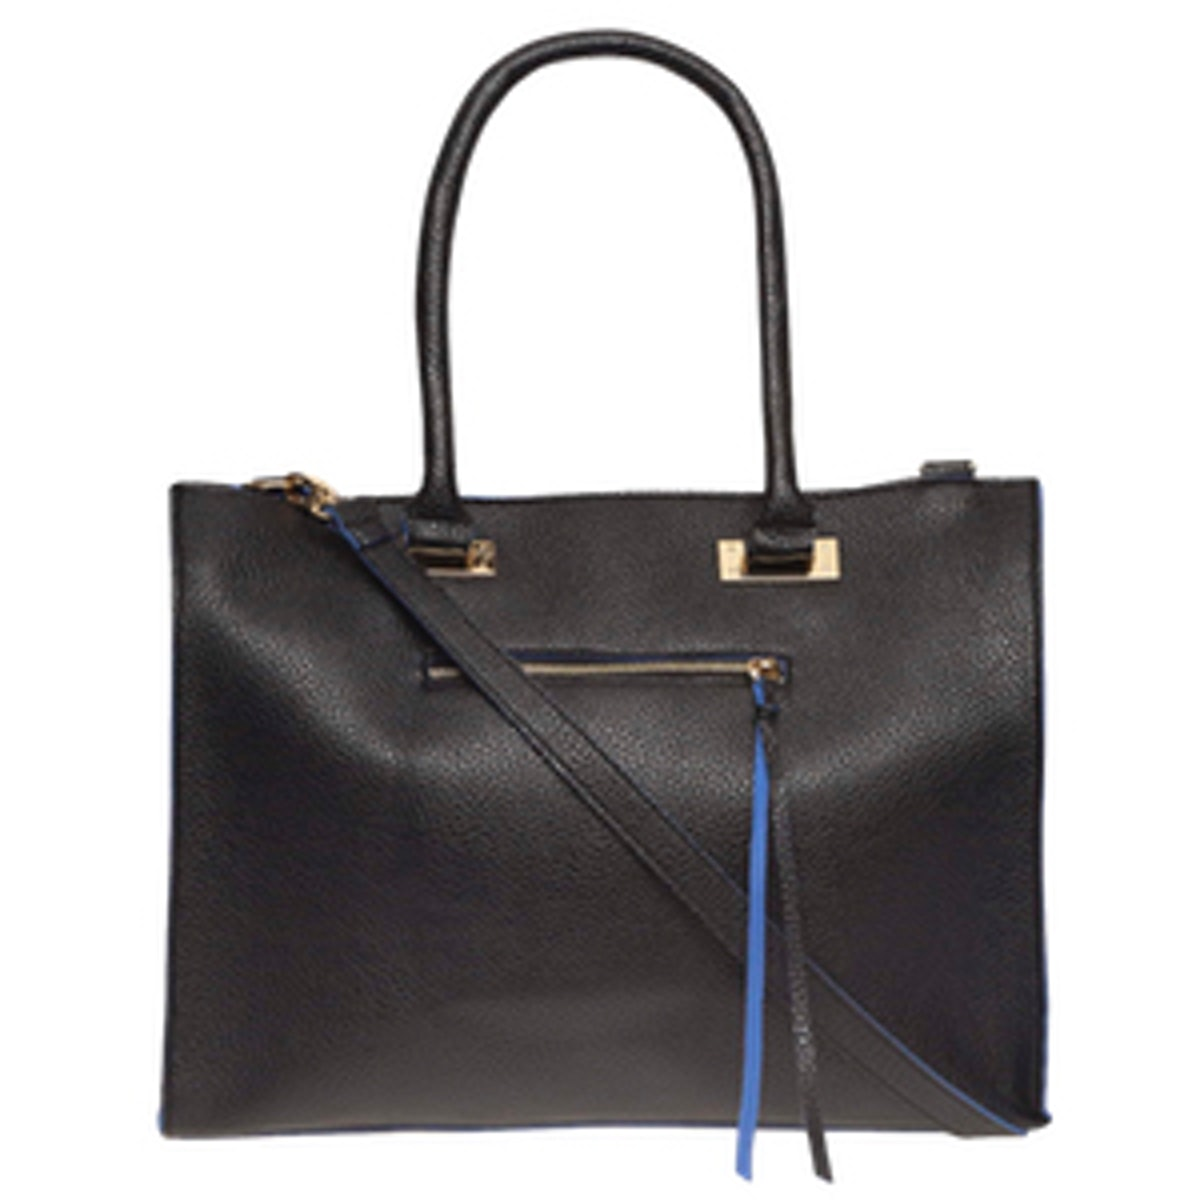 Black and Blue Soft Tote Bag